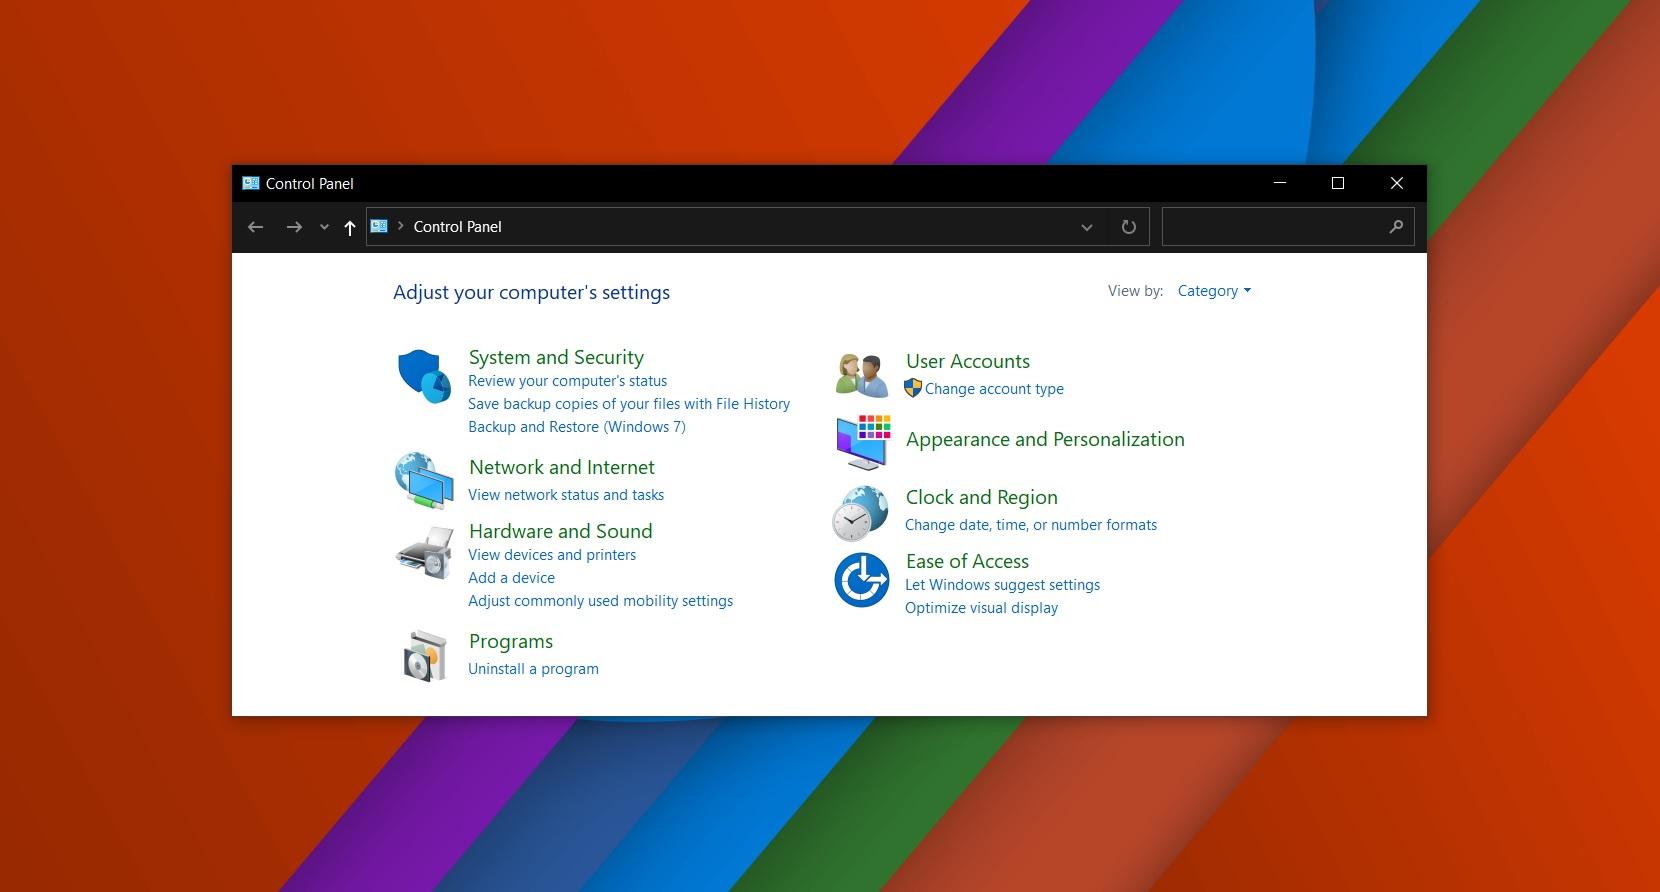 The Windows 10 Control Panel modernization continues